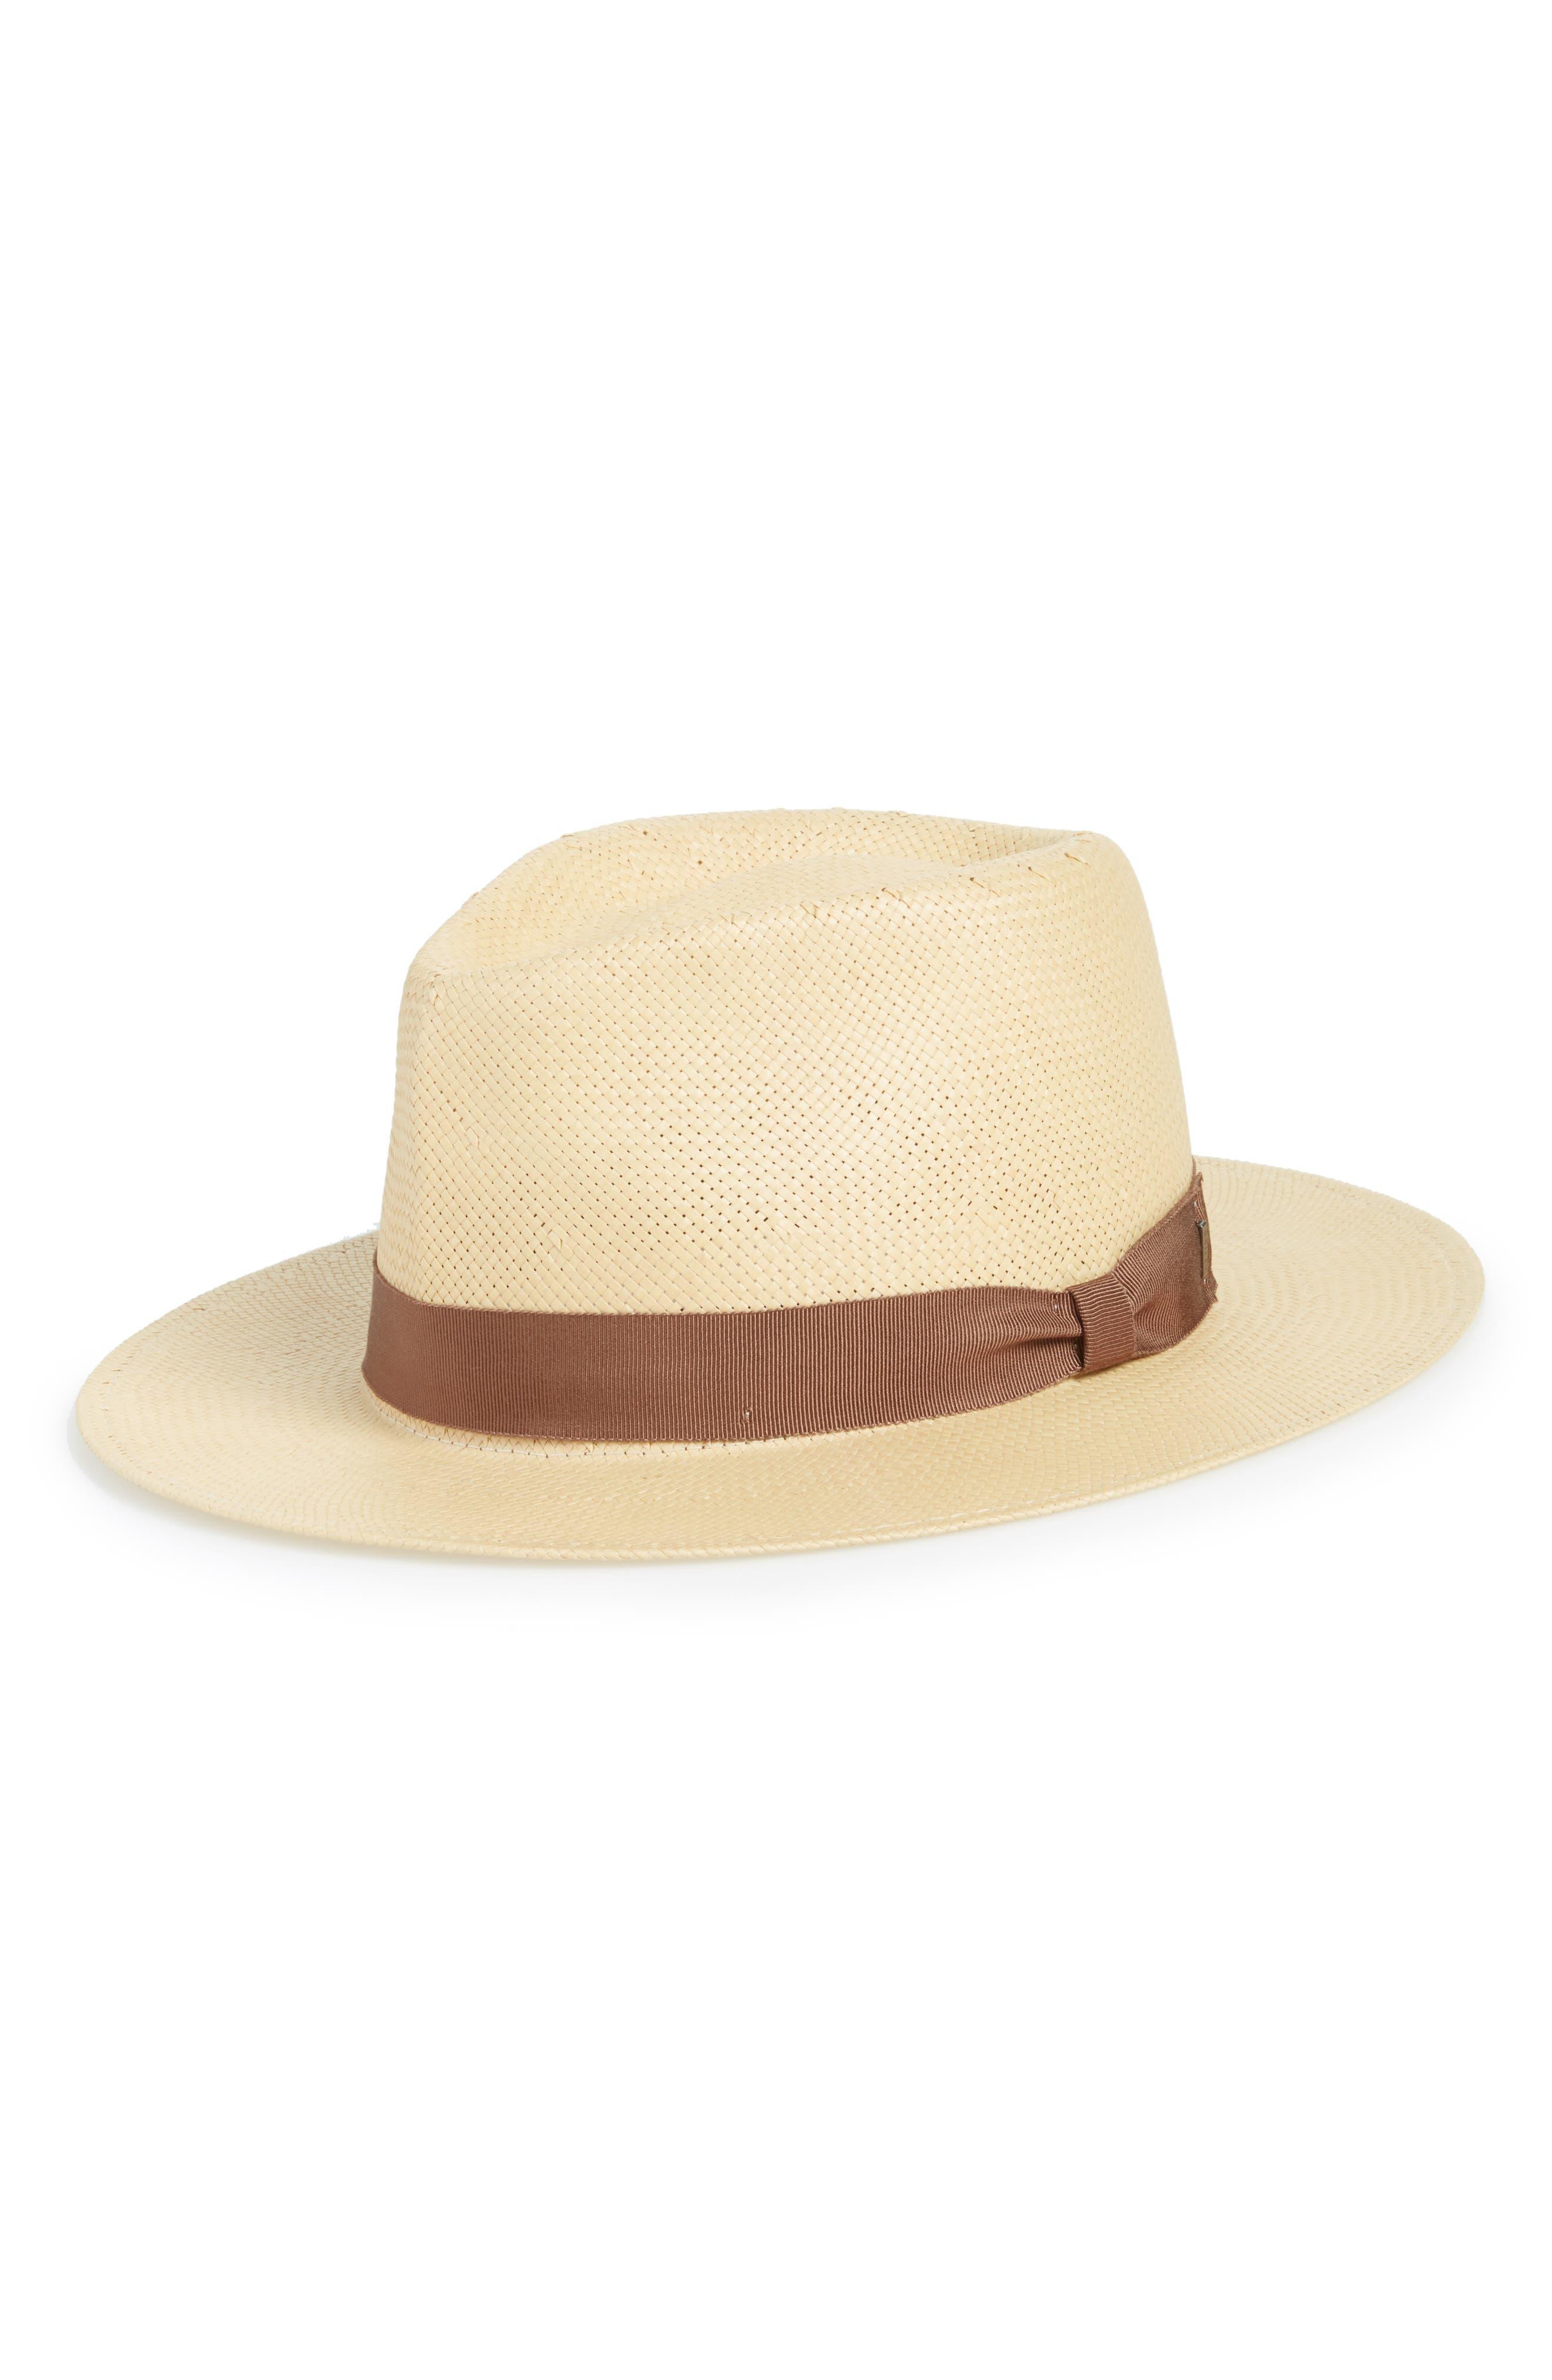 Pencer Straw Panama Hat,                         Main,                         color, Sandbar